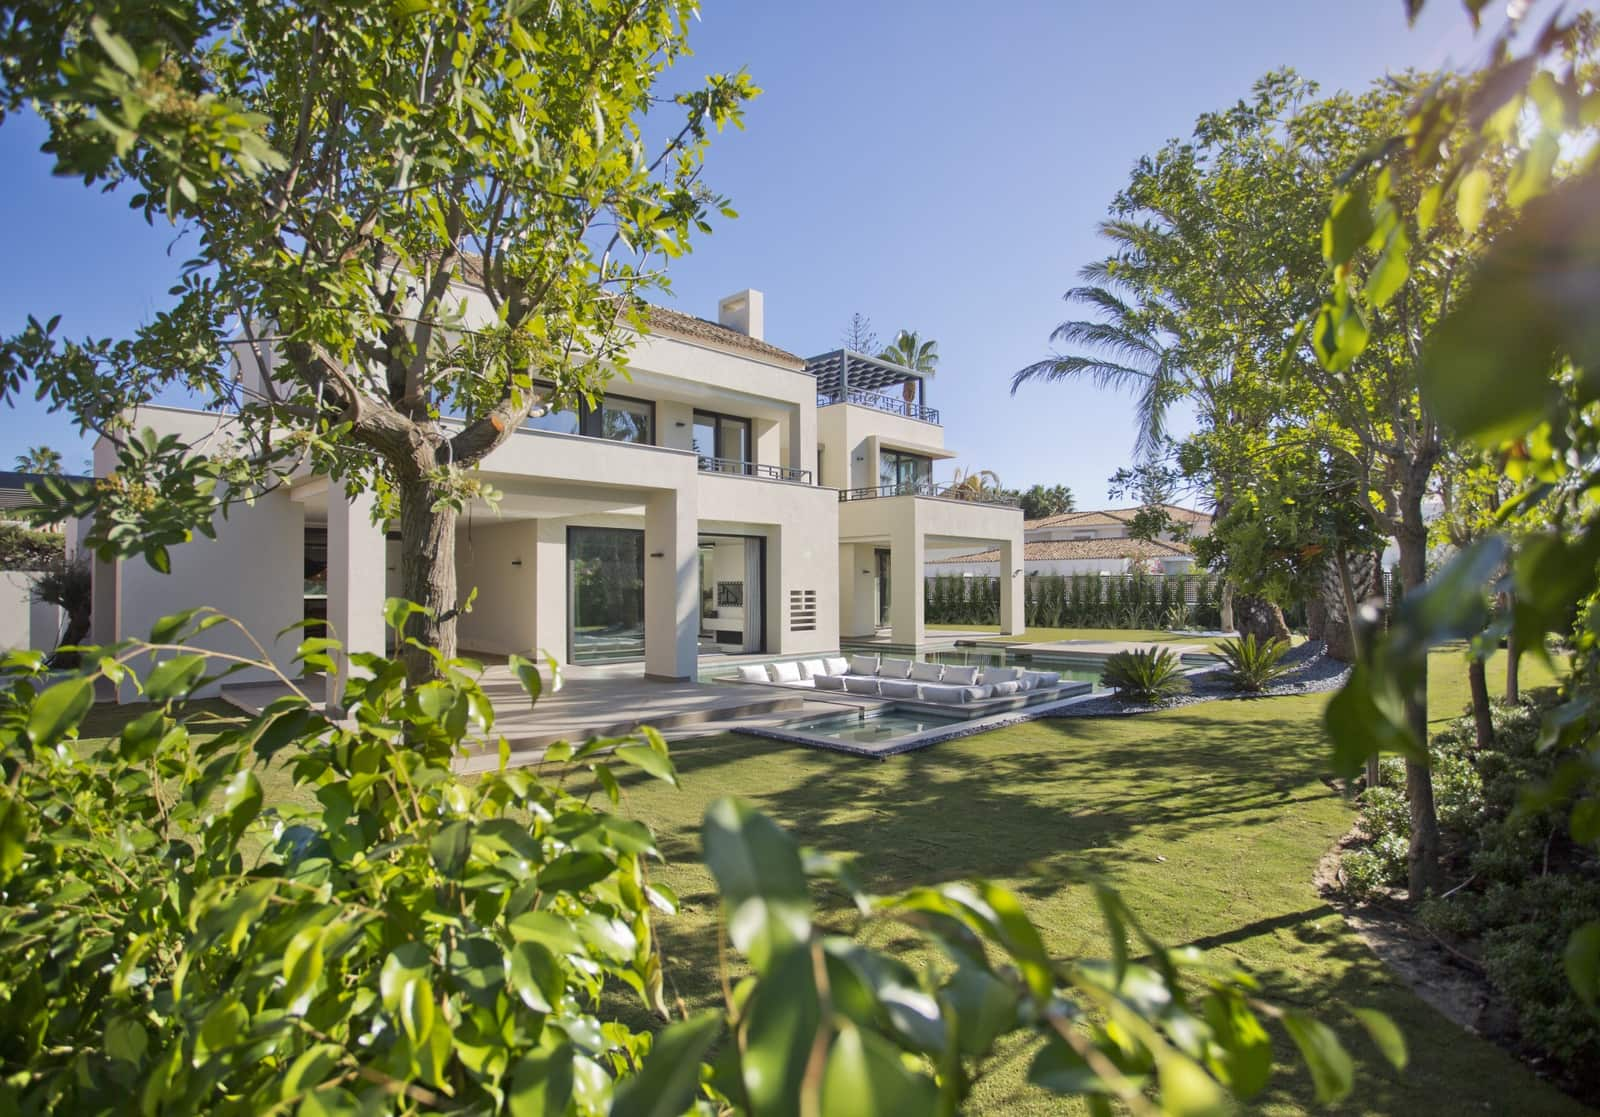 4 bedroom Villa for sale in Estepona with pool - € 3,200,000 (Ref: 5753305)